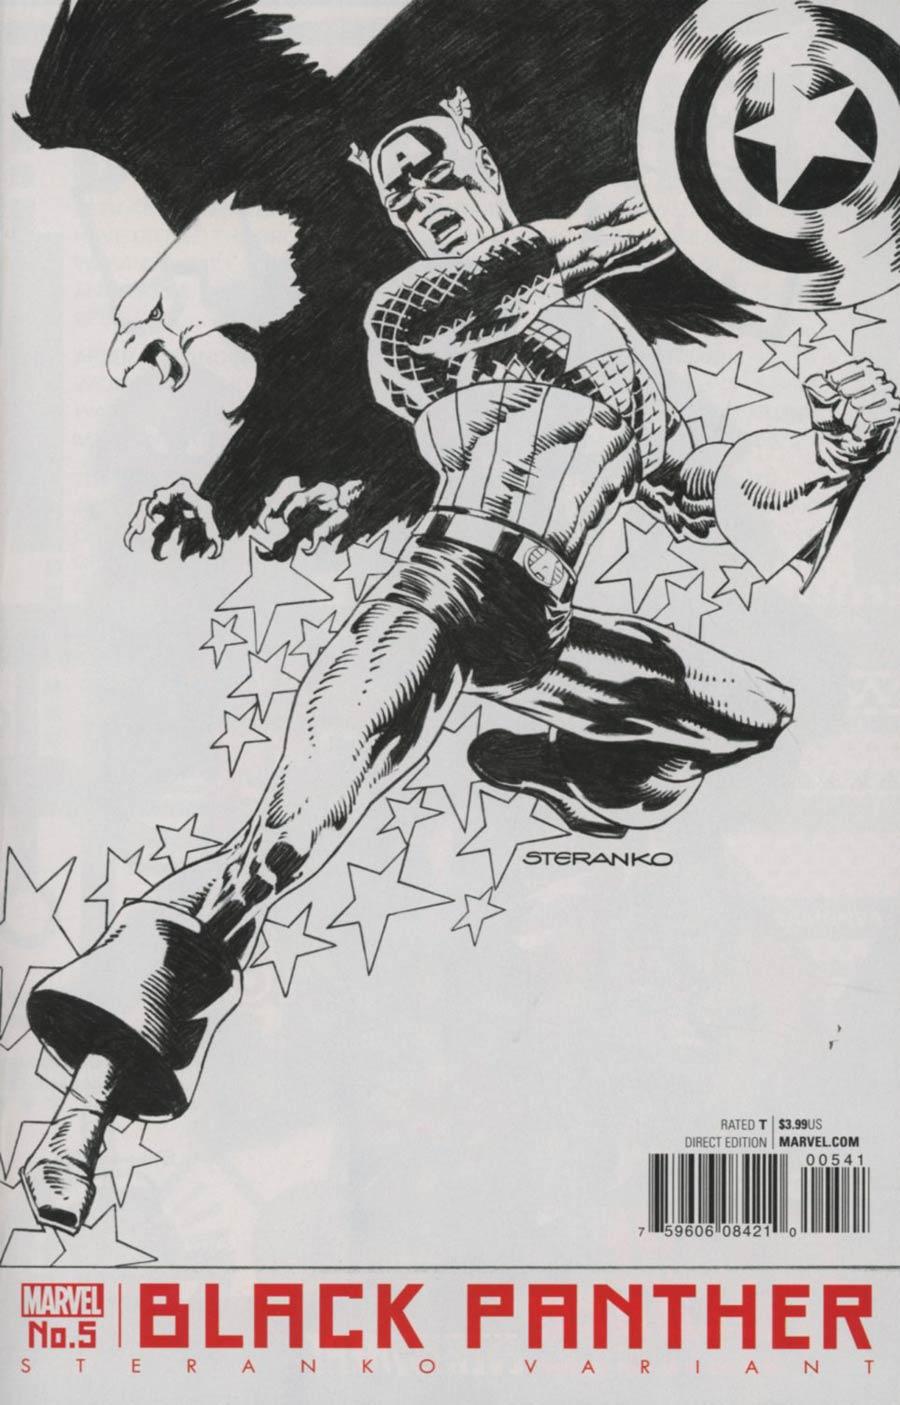 Black Panther Vol 6 #5 Cover C Variant Jim Steranko Captain America Black & White Cover